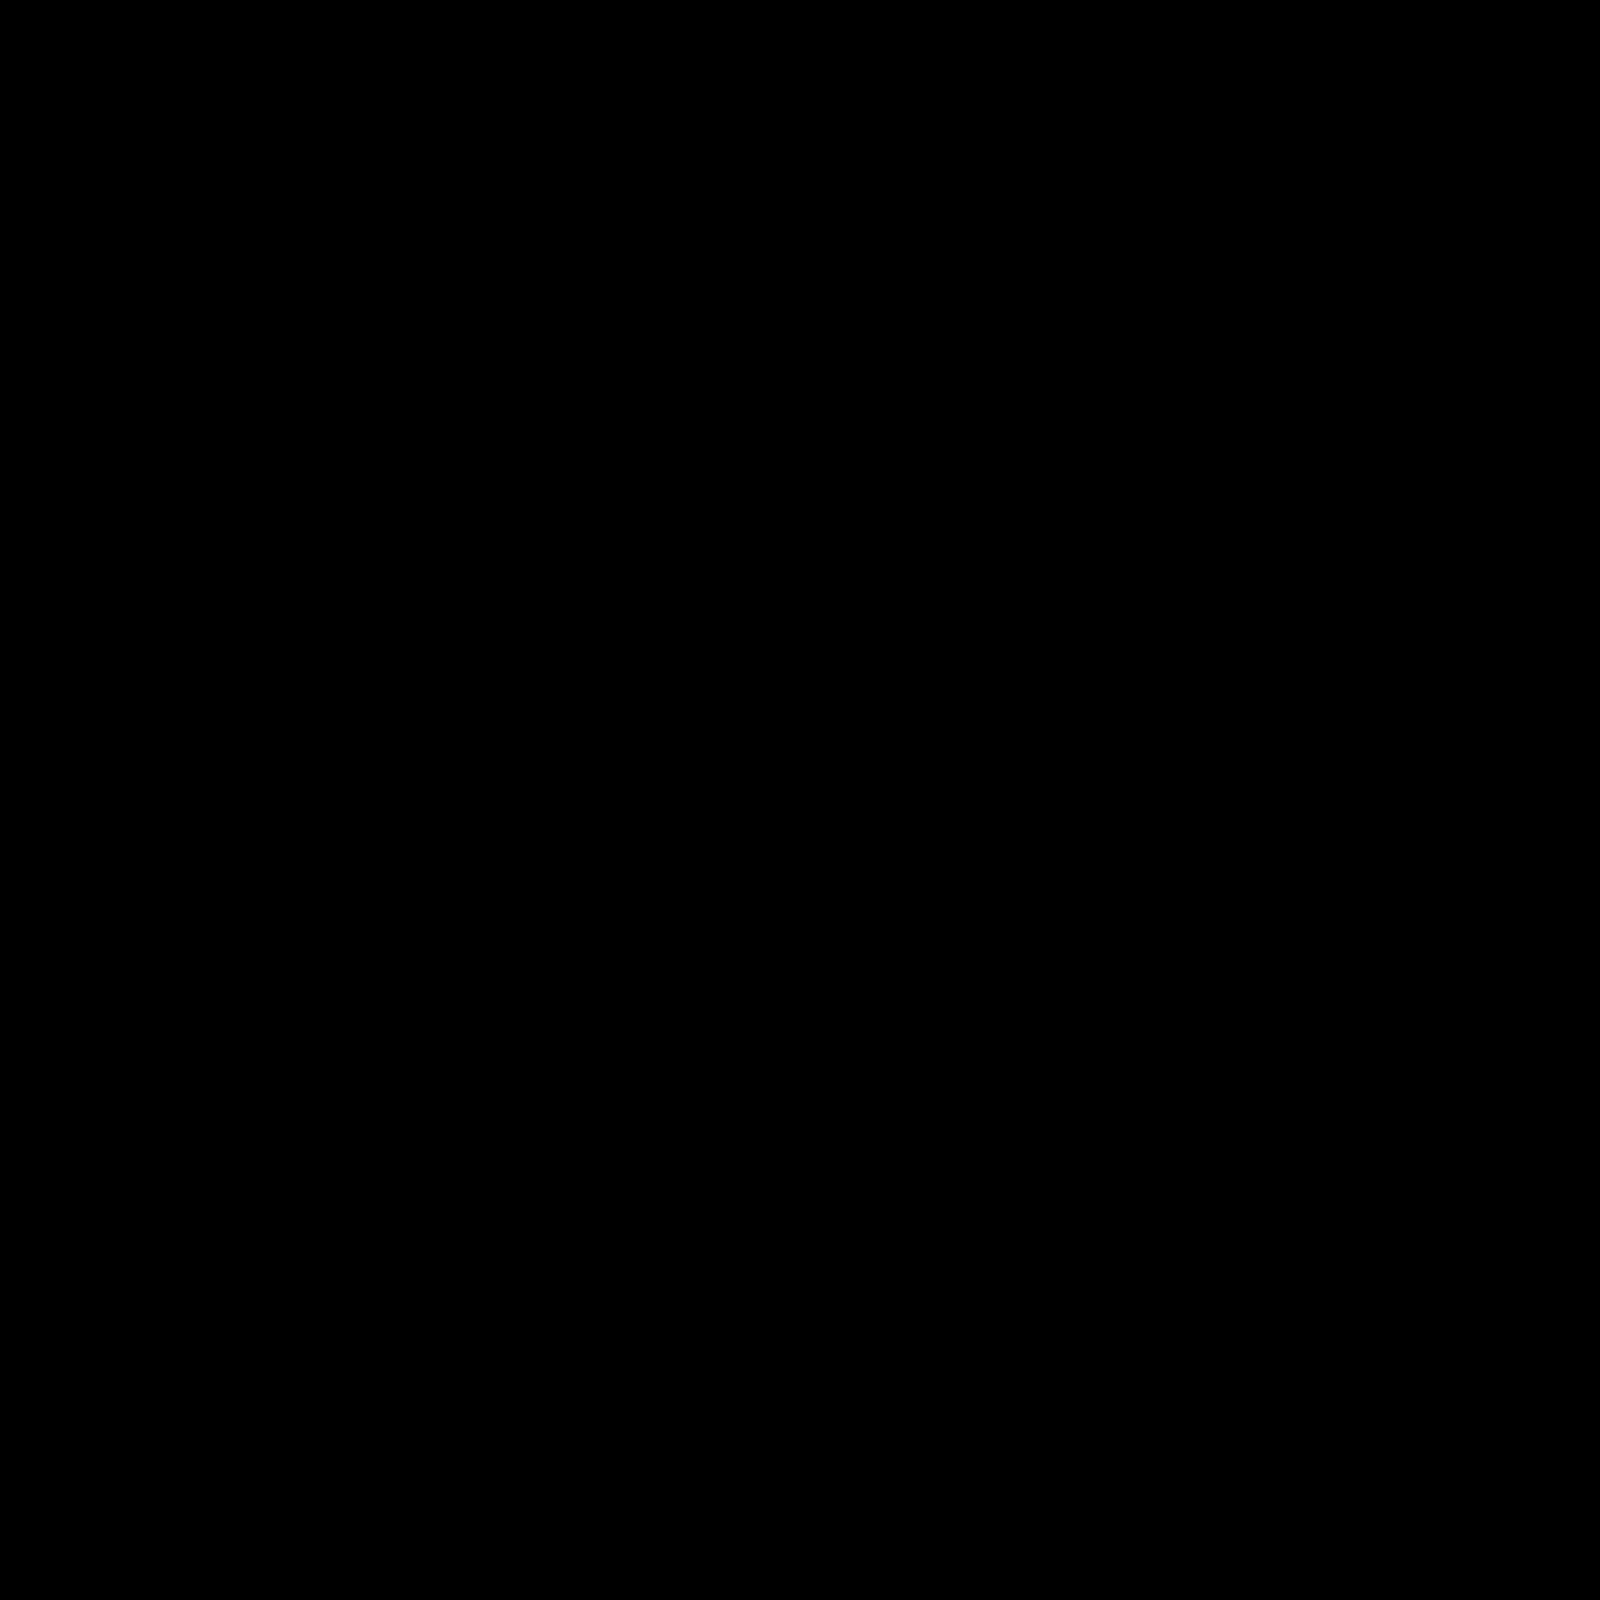 Double Down icon